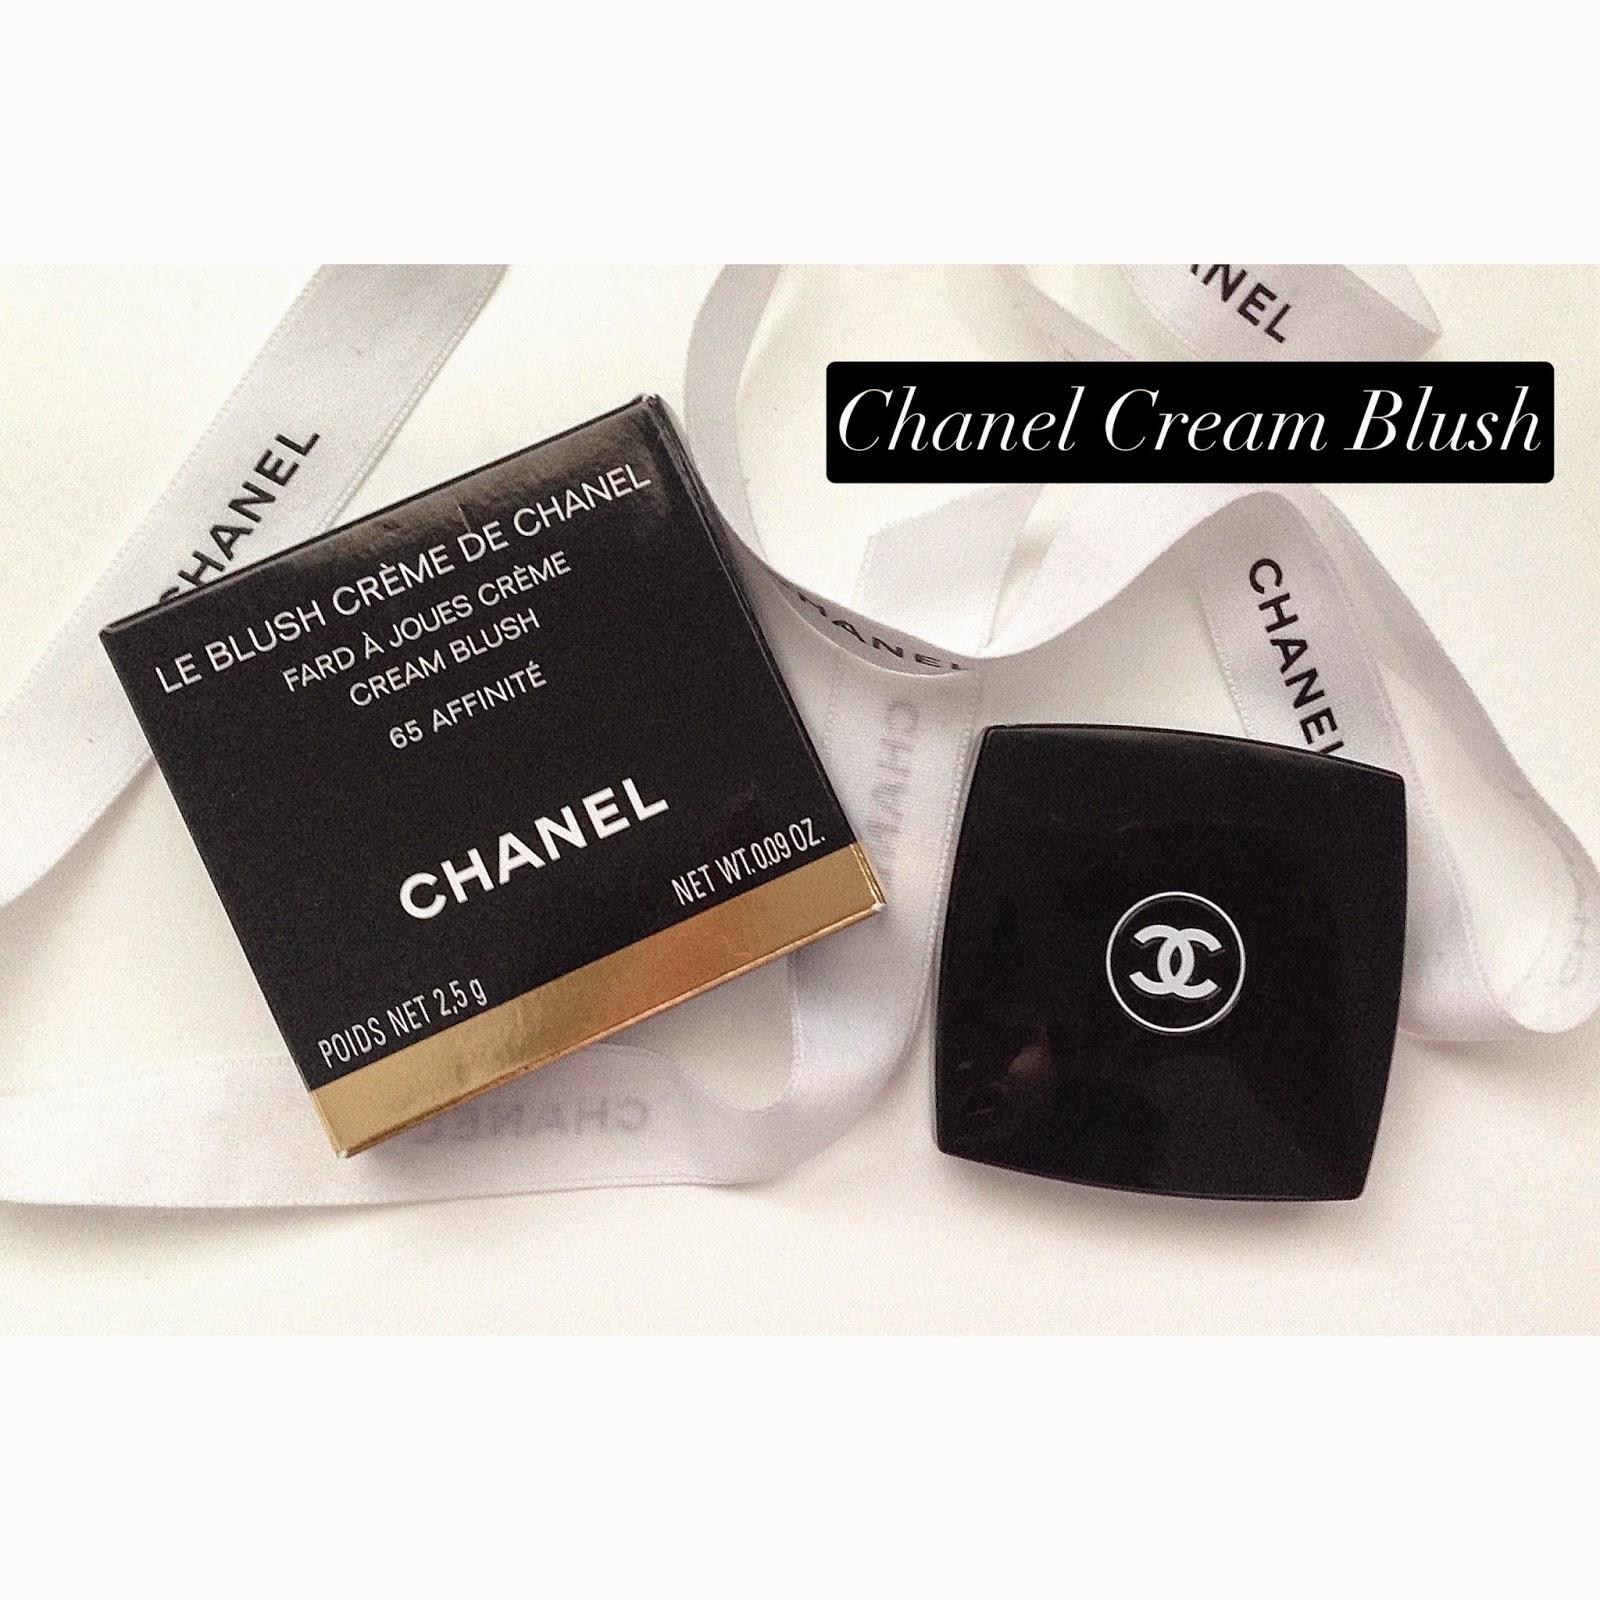 chanel blush cream review